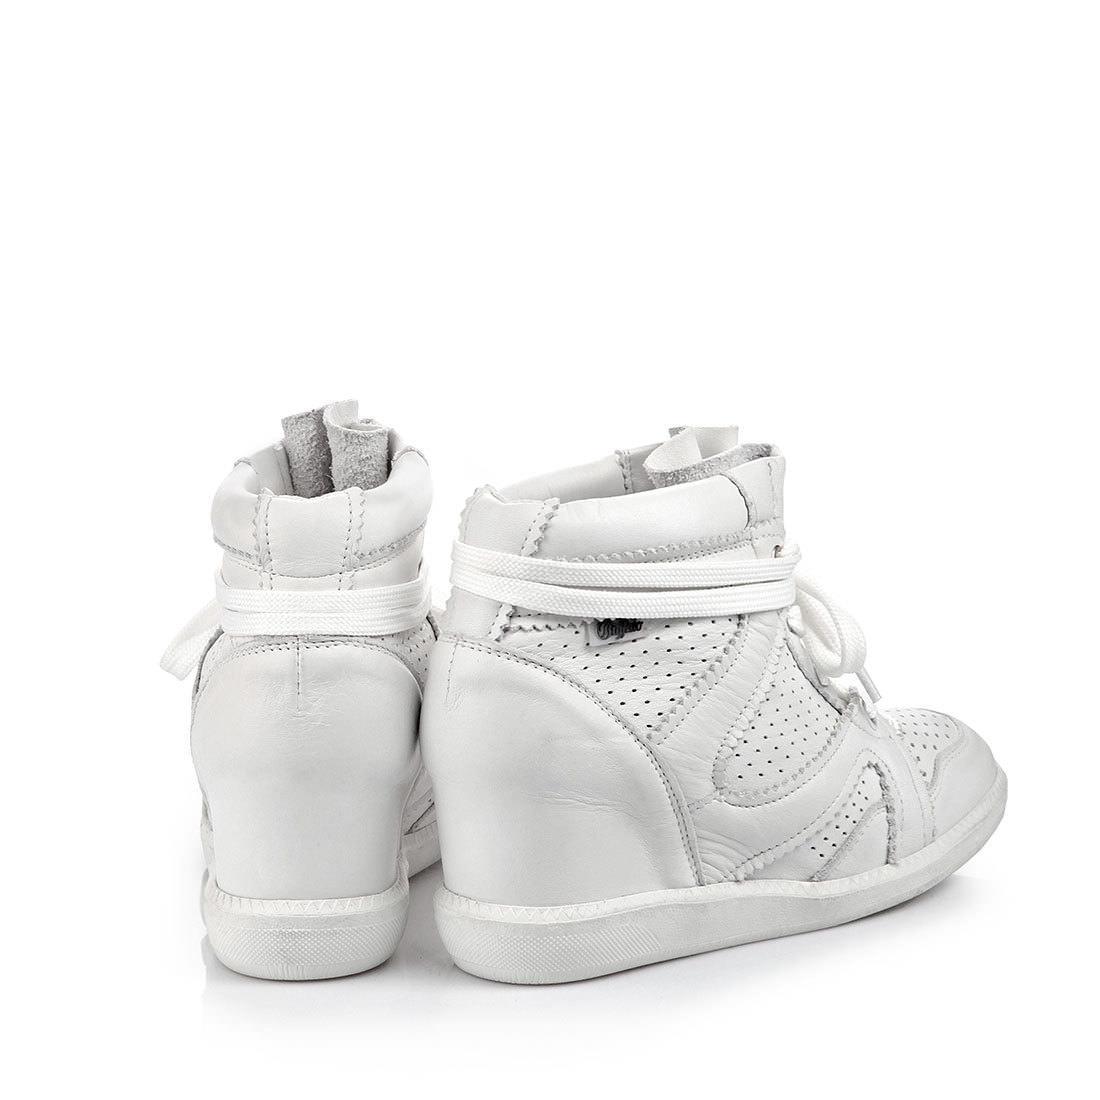 6e74c6e706 Buffalo sneakers with INNER WEDGE buy online in BUFFALO Online-Shop ...